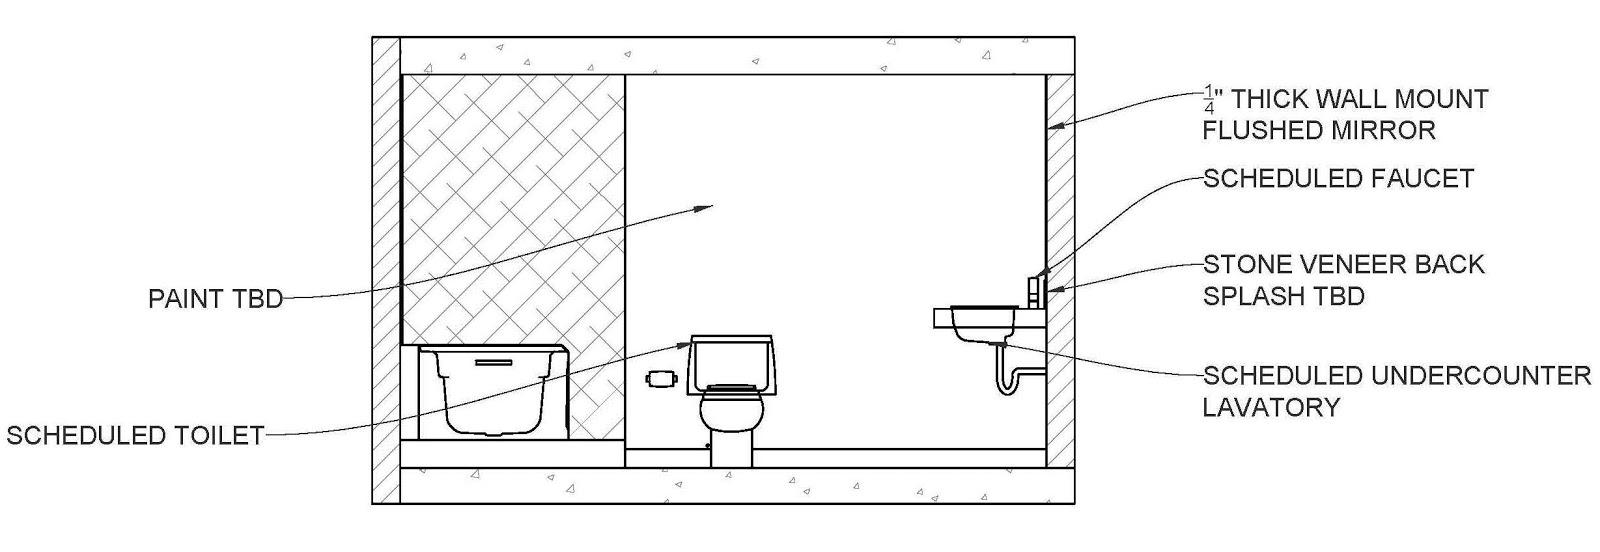 Interior architectural designs cad elevations samples for Interior elevation designs